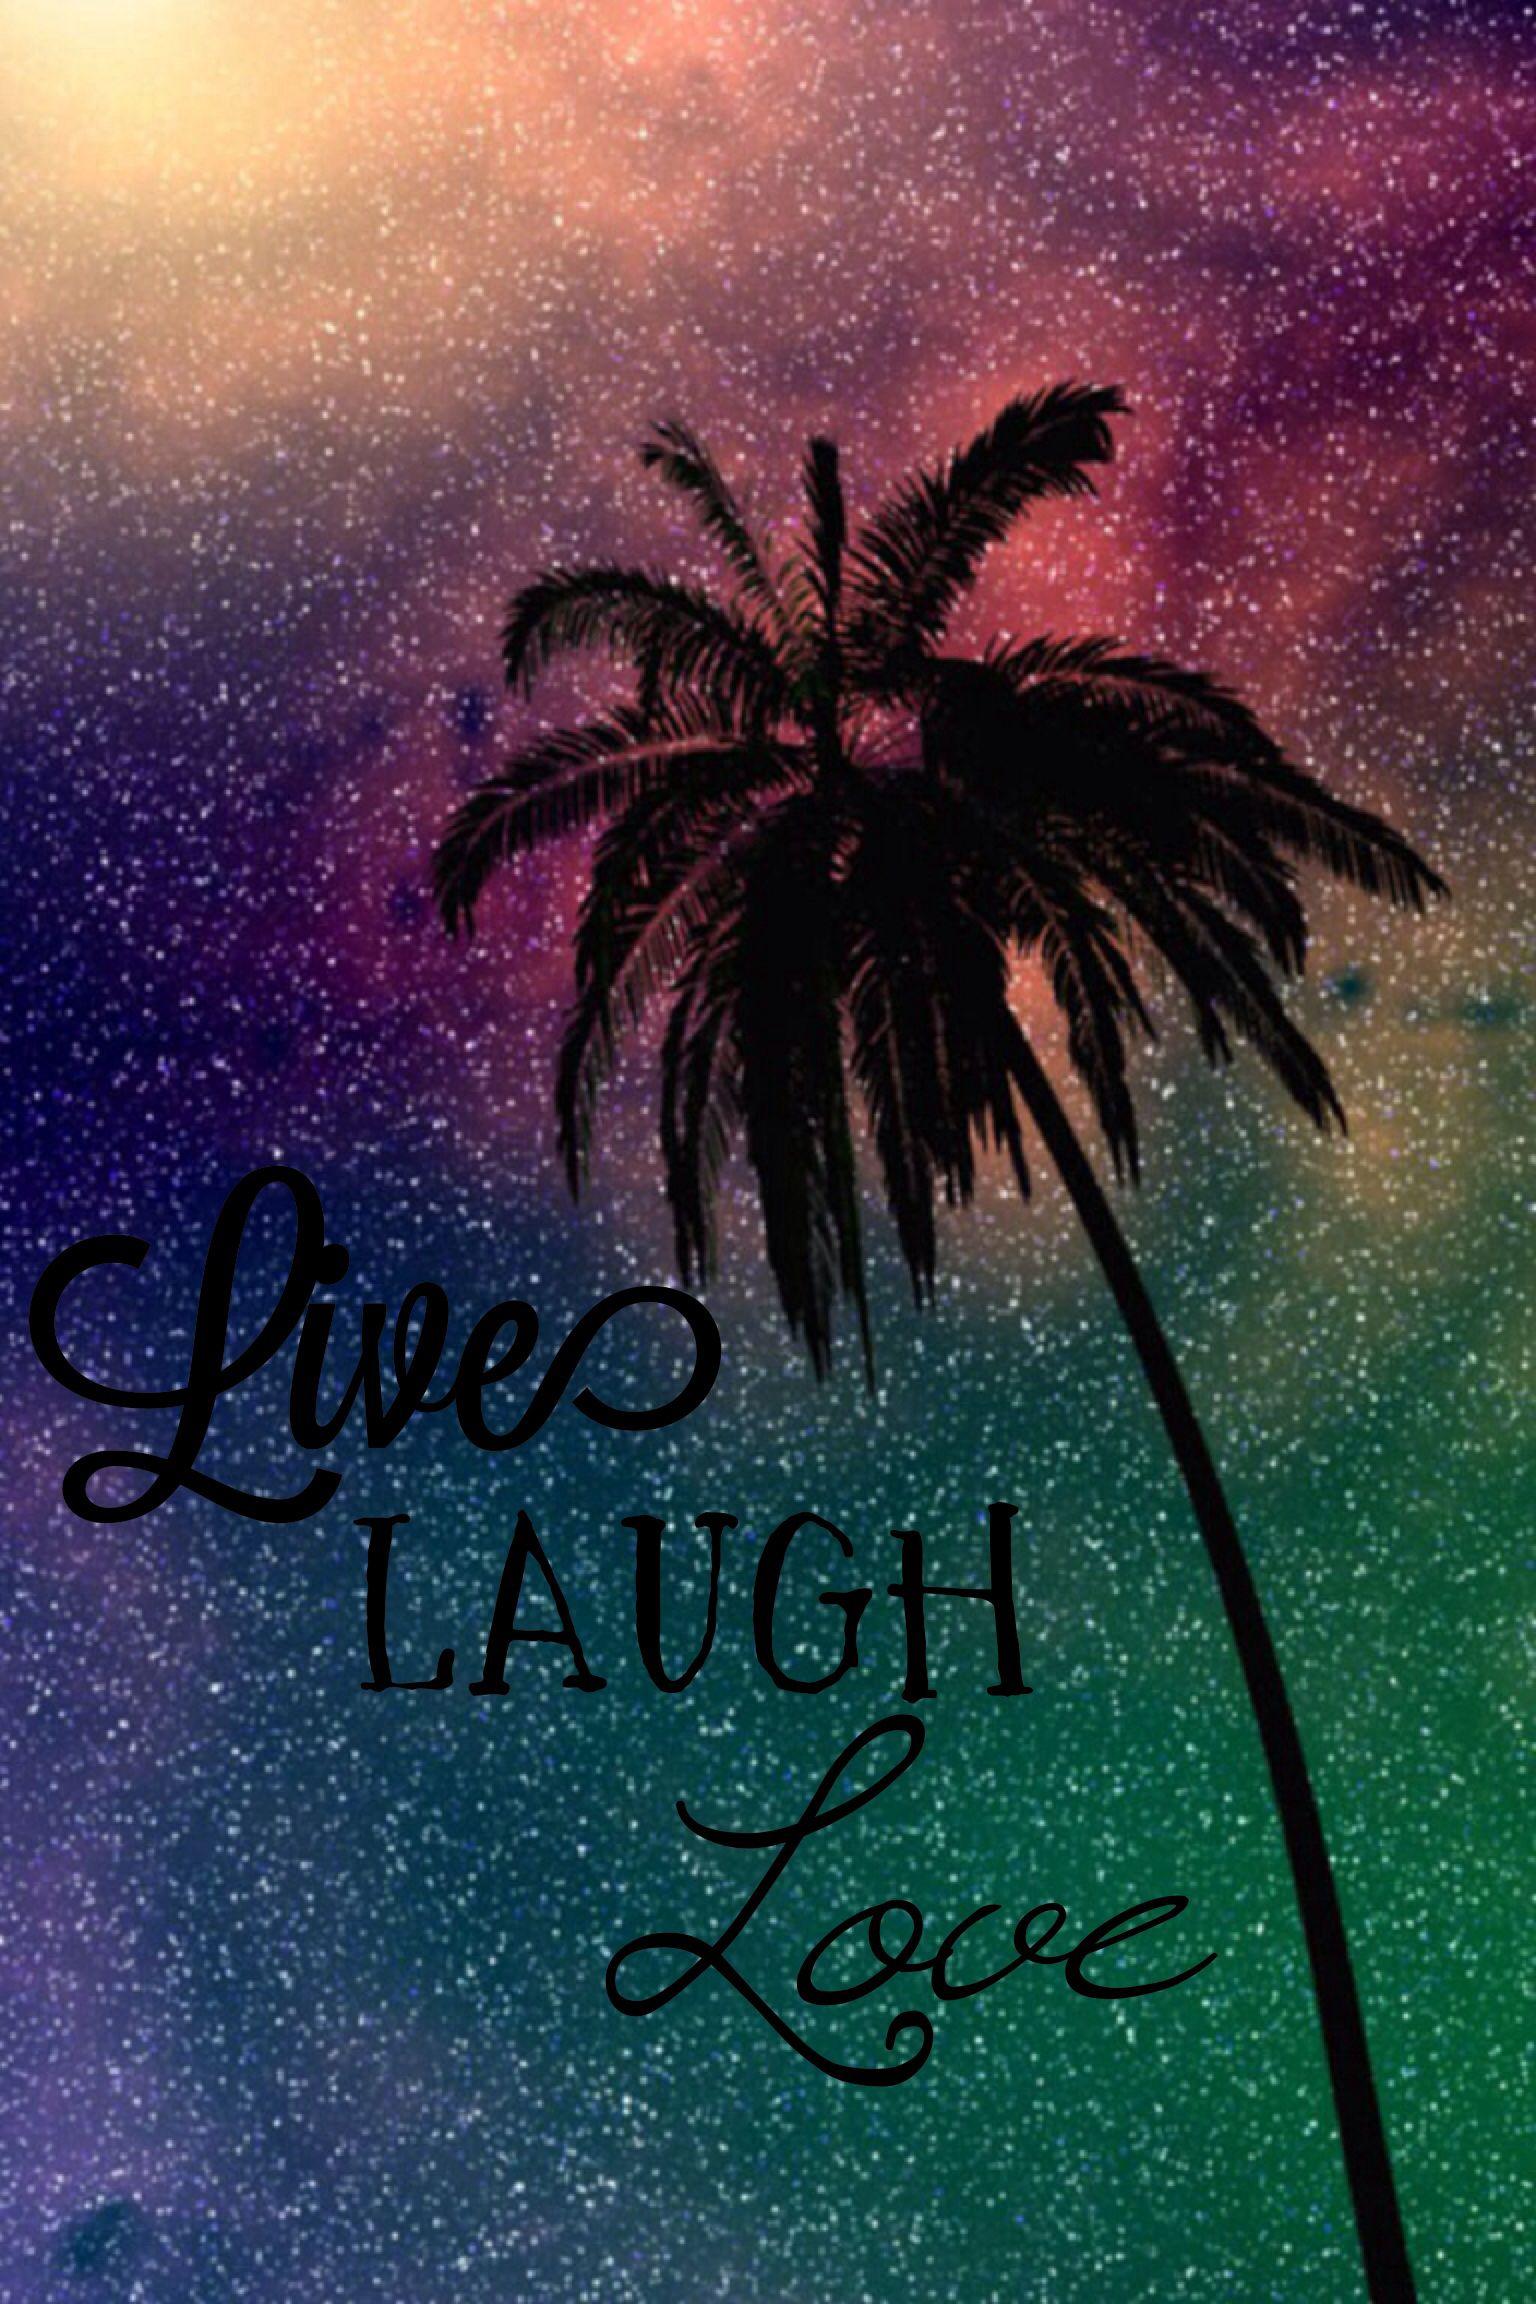 Live Laugh Love Wallpaper Backgrounds Cellphone Wallpaper Phone Wallpaper Galaxy live laugh love wallpaper